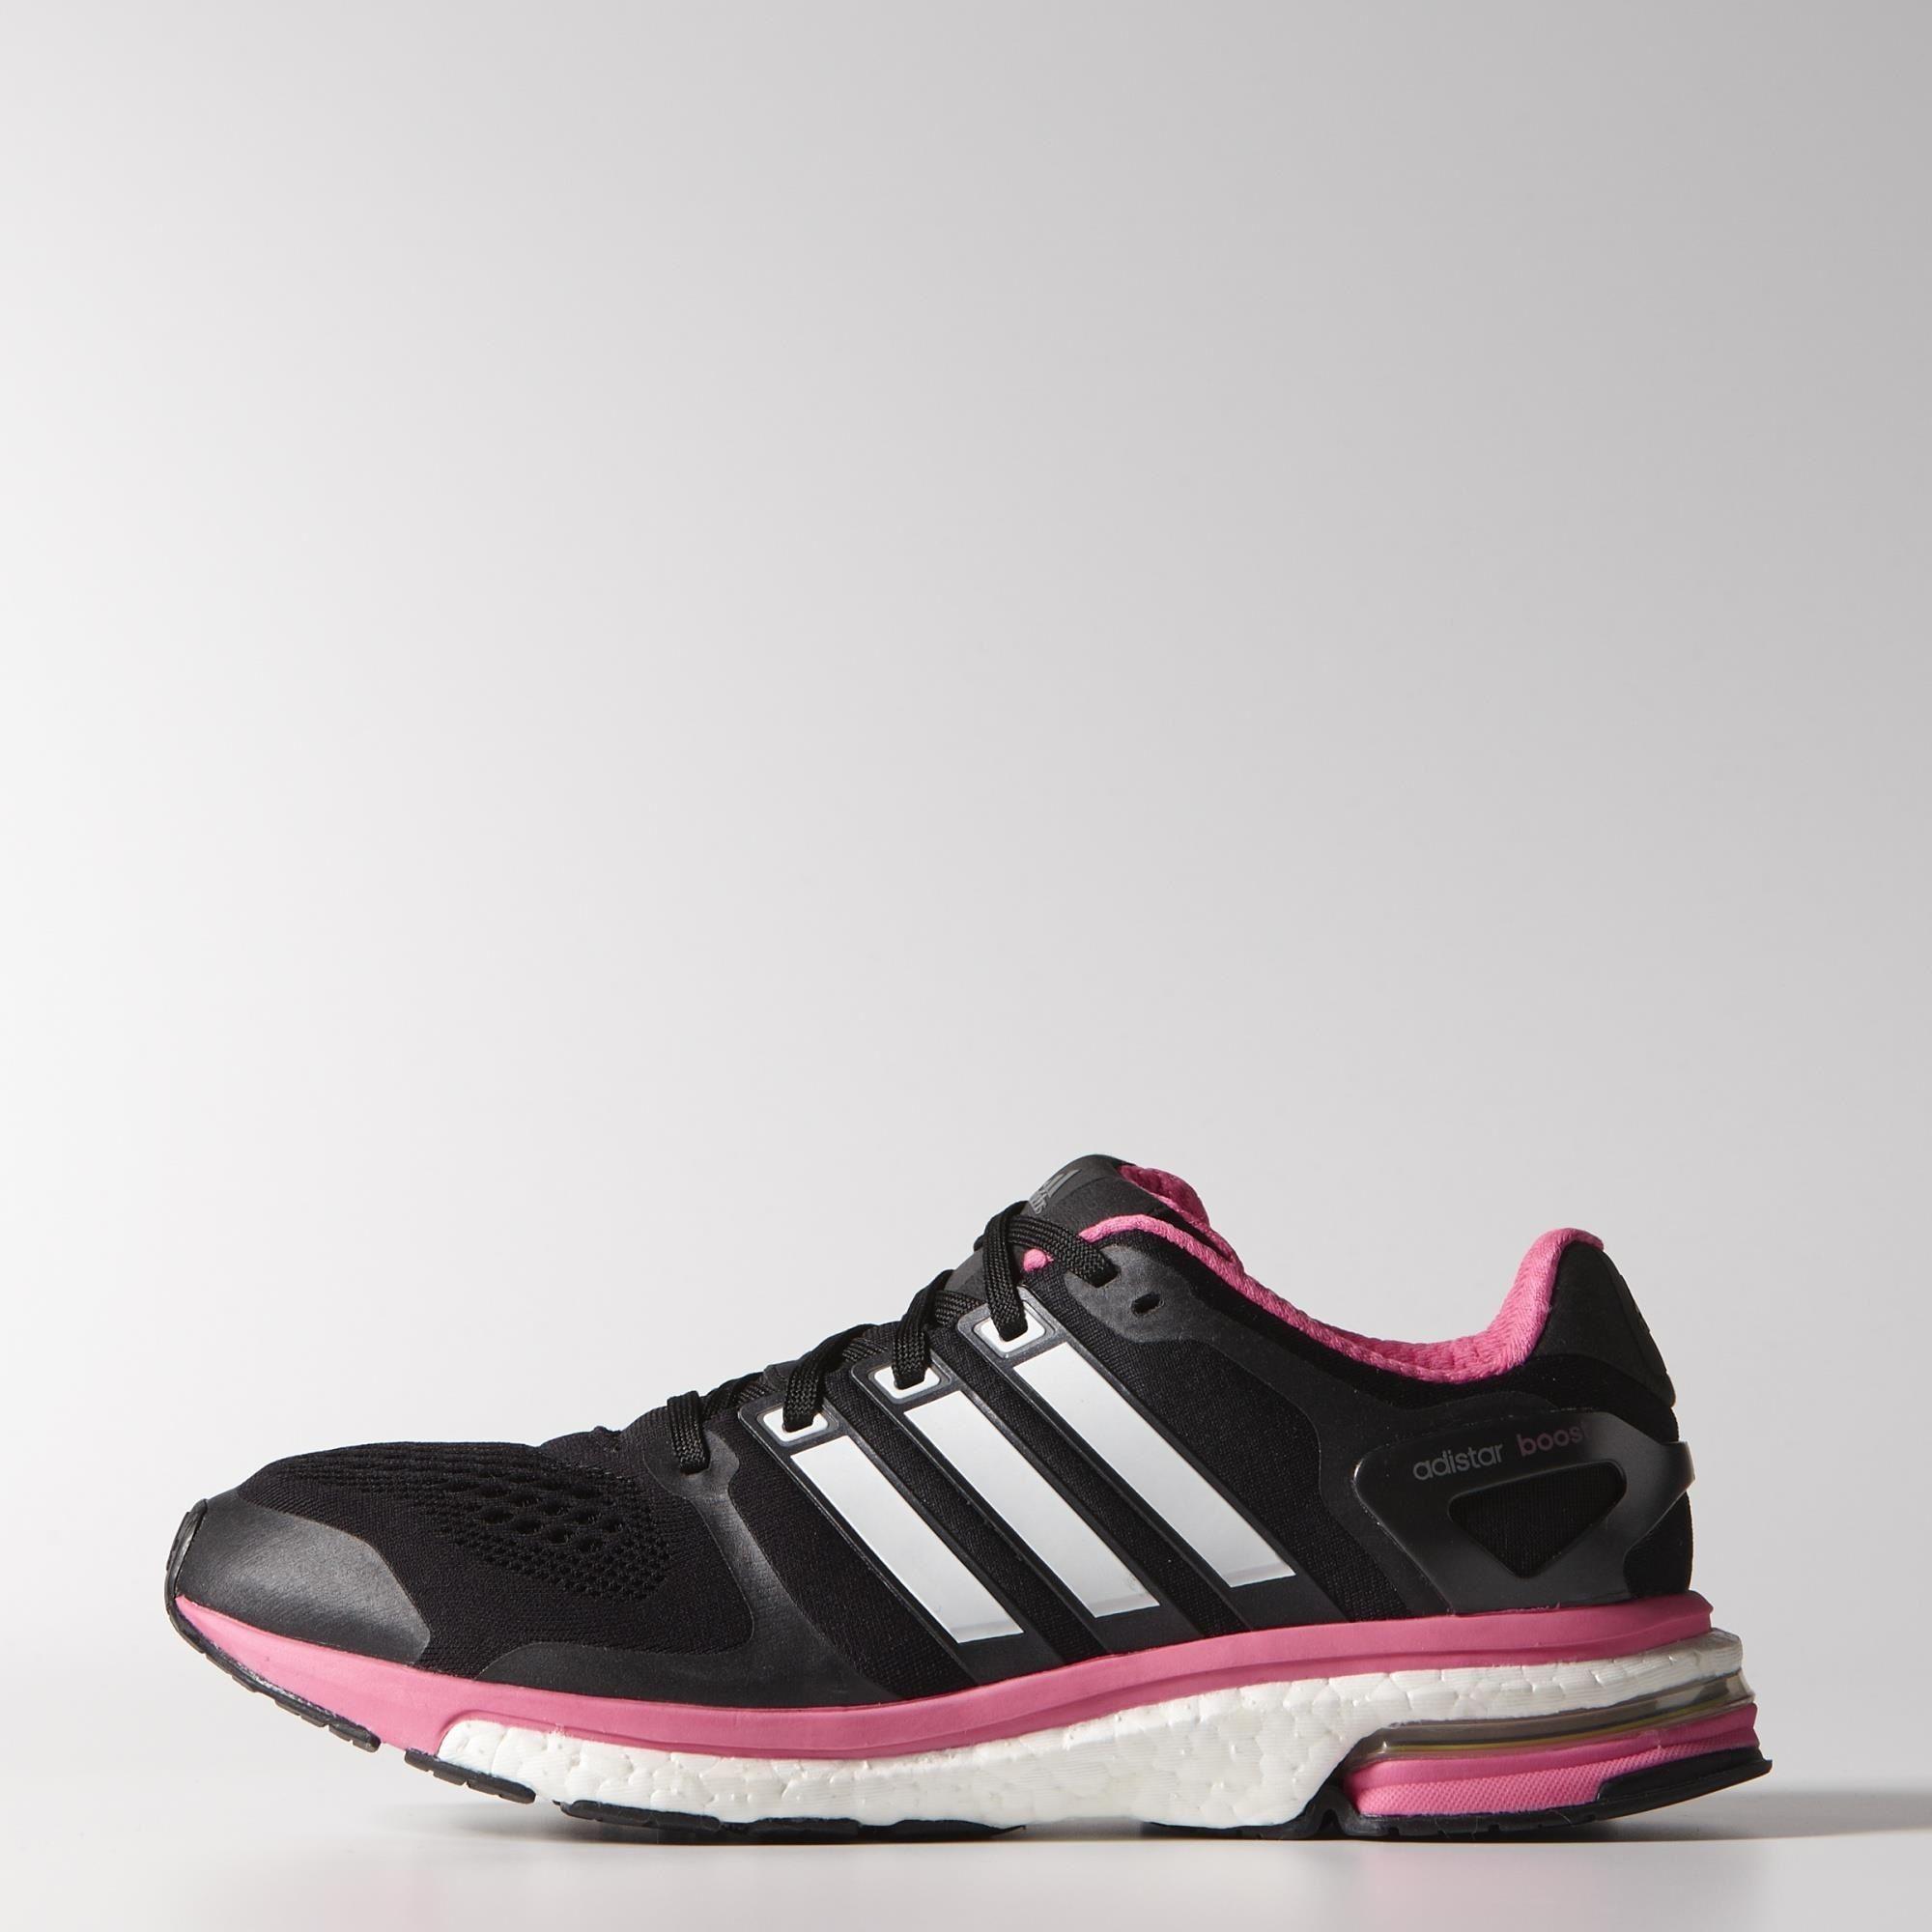 low cost 6257f 71dd4 adidas - Zapatos para Correr adistar Boost ESM Mujer